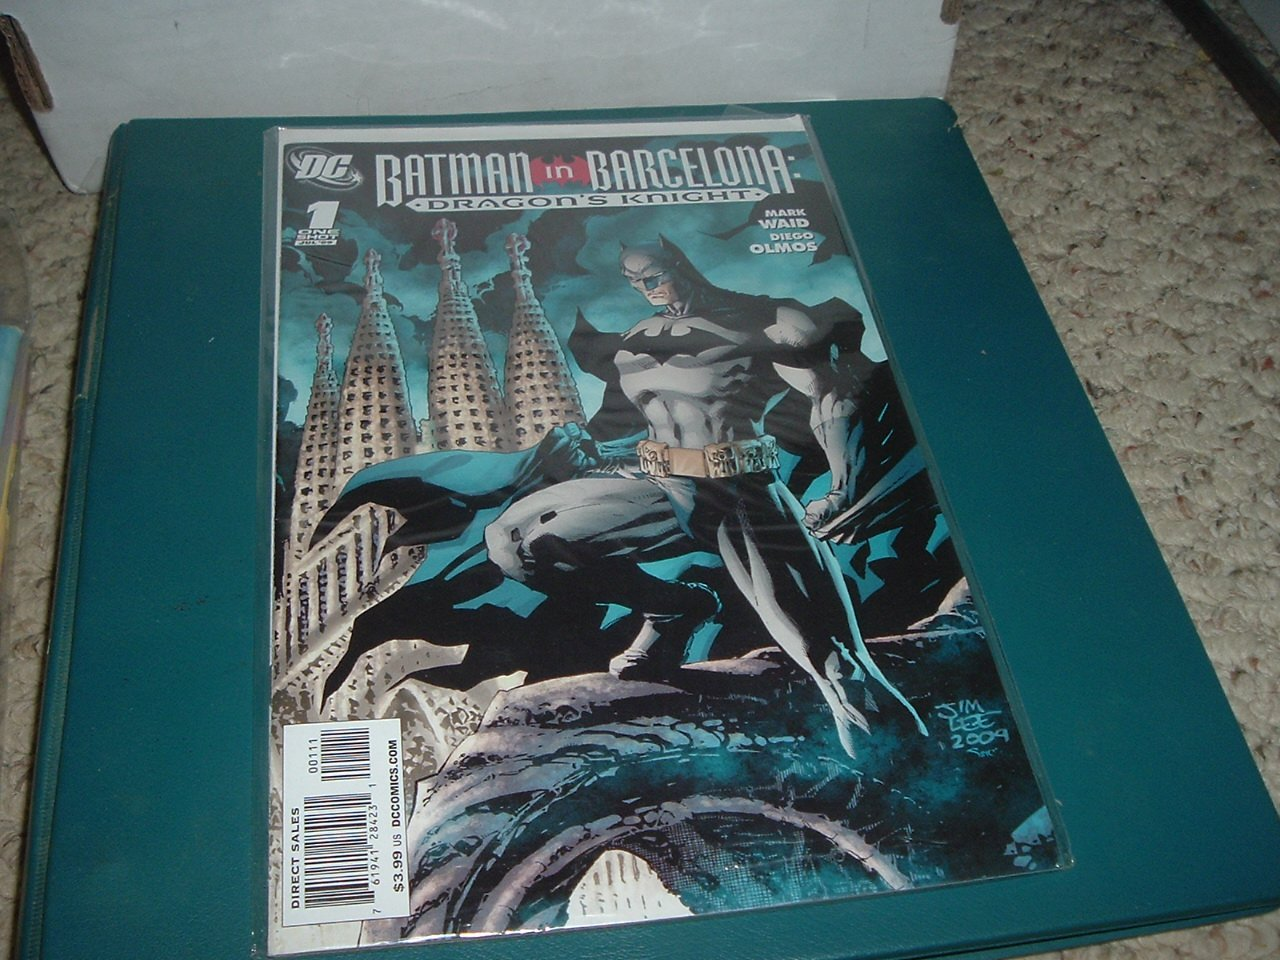 Batman in Barcelona: Dragon's Knight 1-Shot Graphic Novel NR MINT (DC Comics Waid Jim Lee) for sale